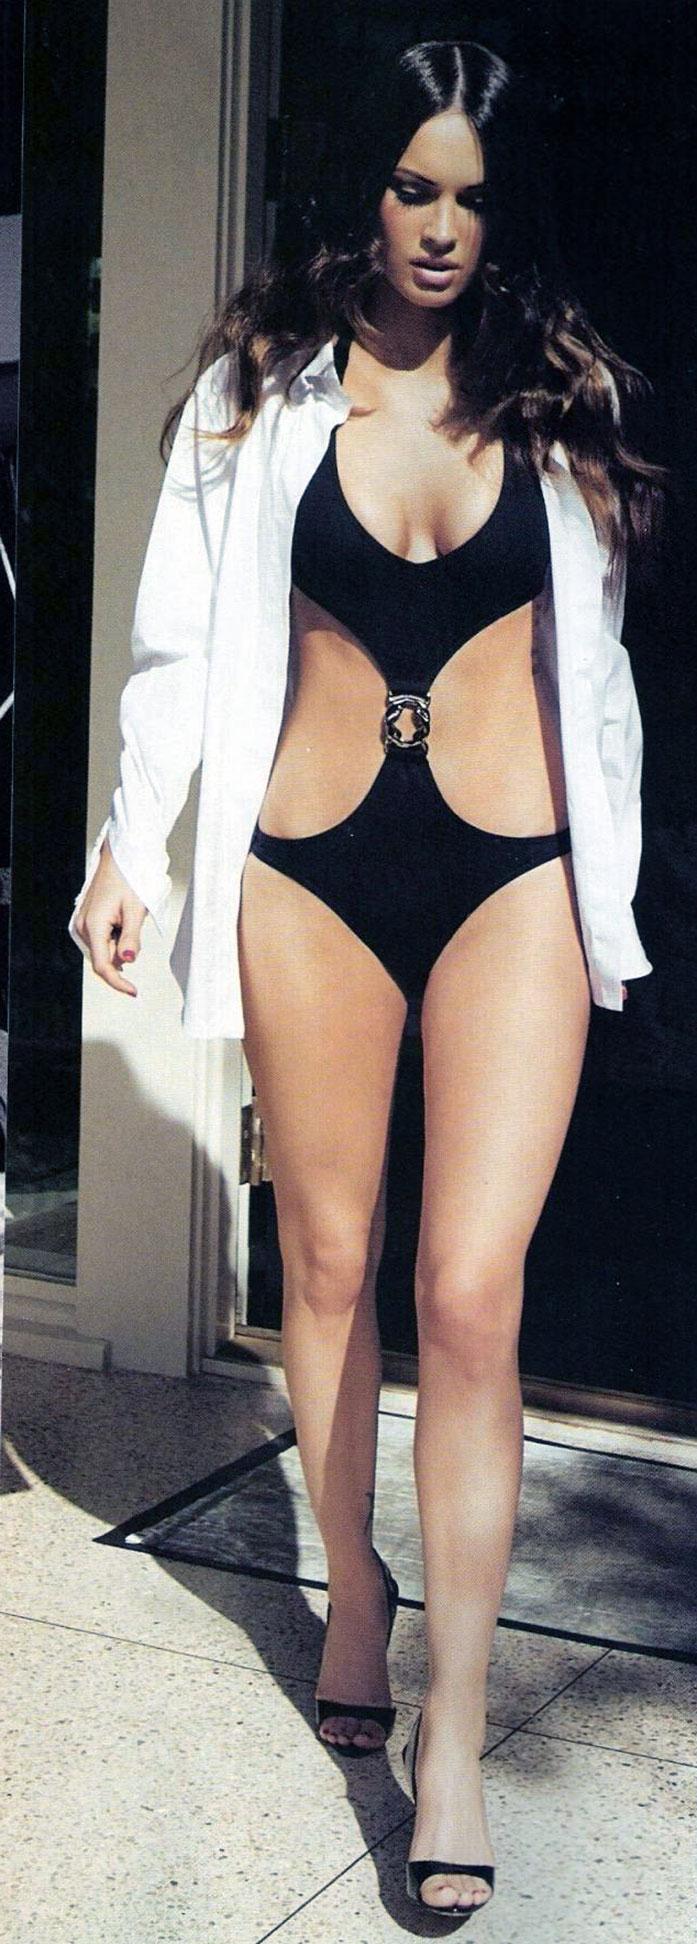 Megan Fox bikini